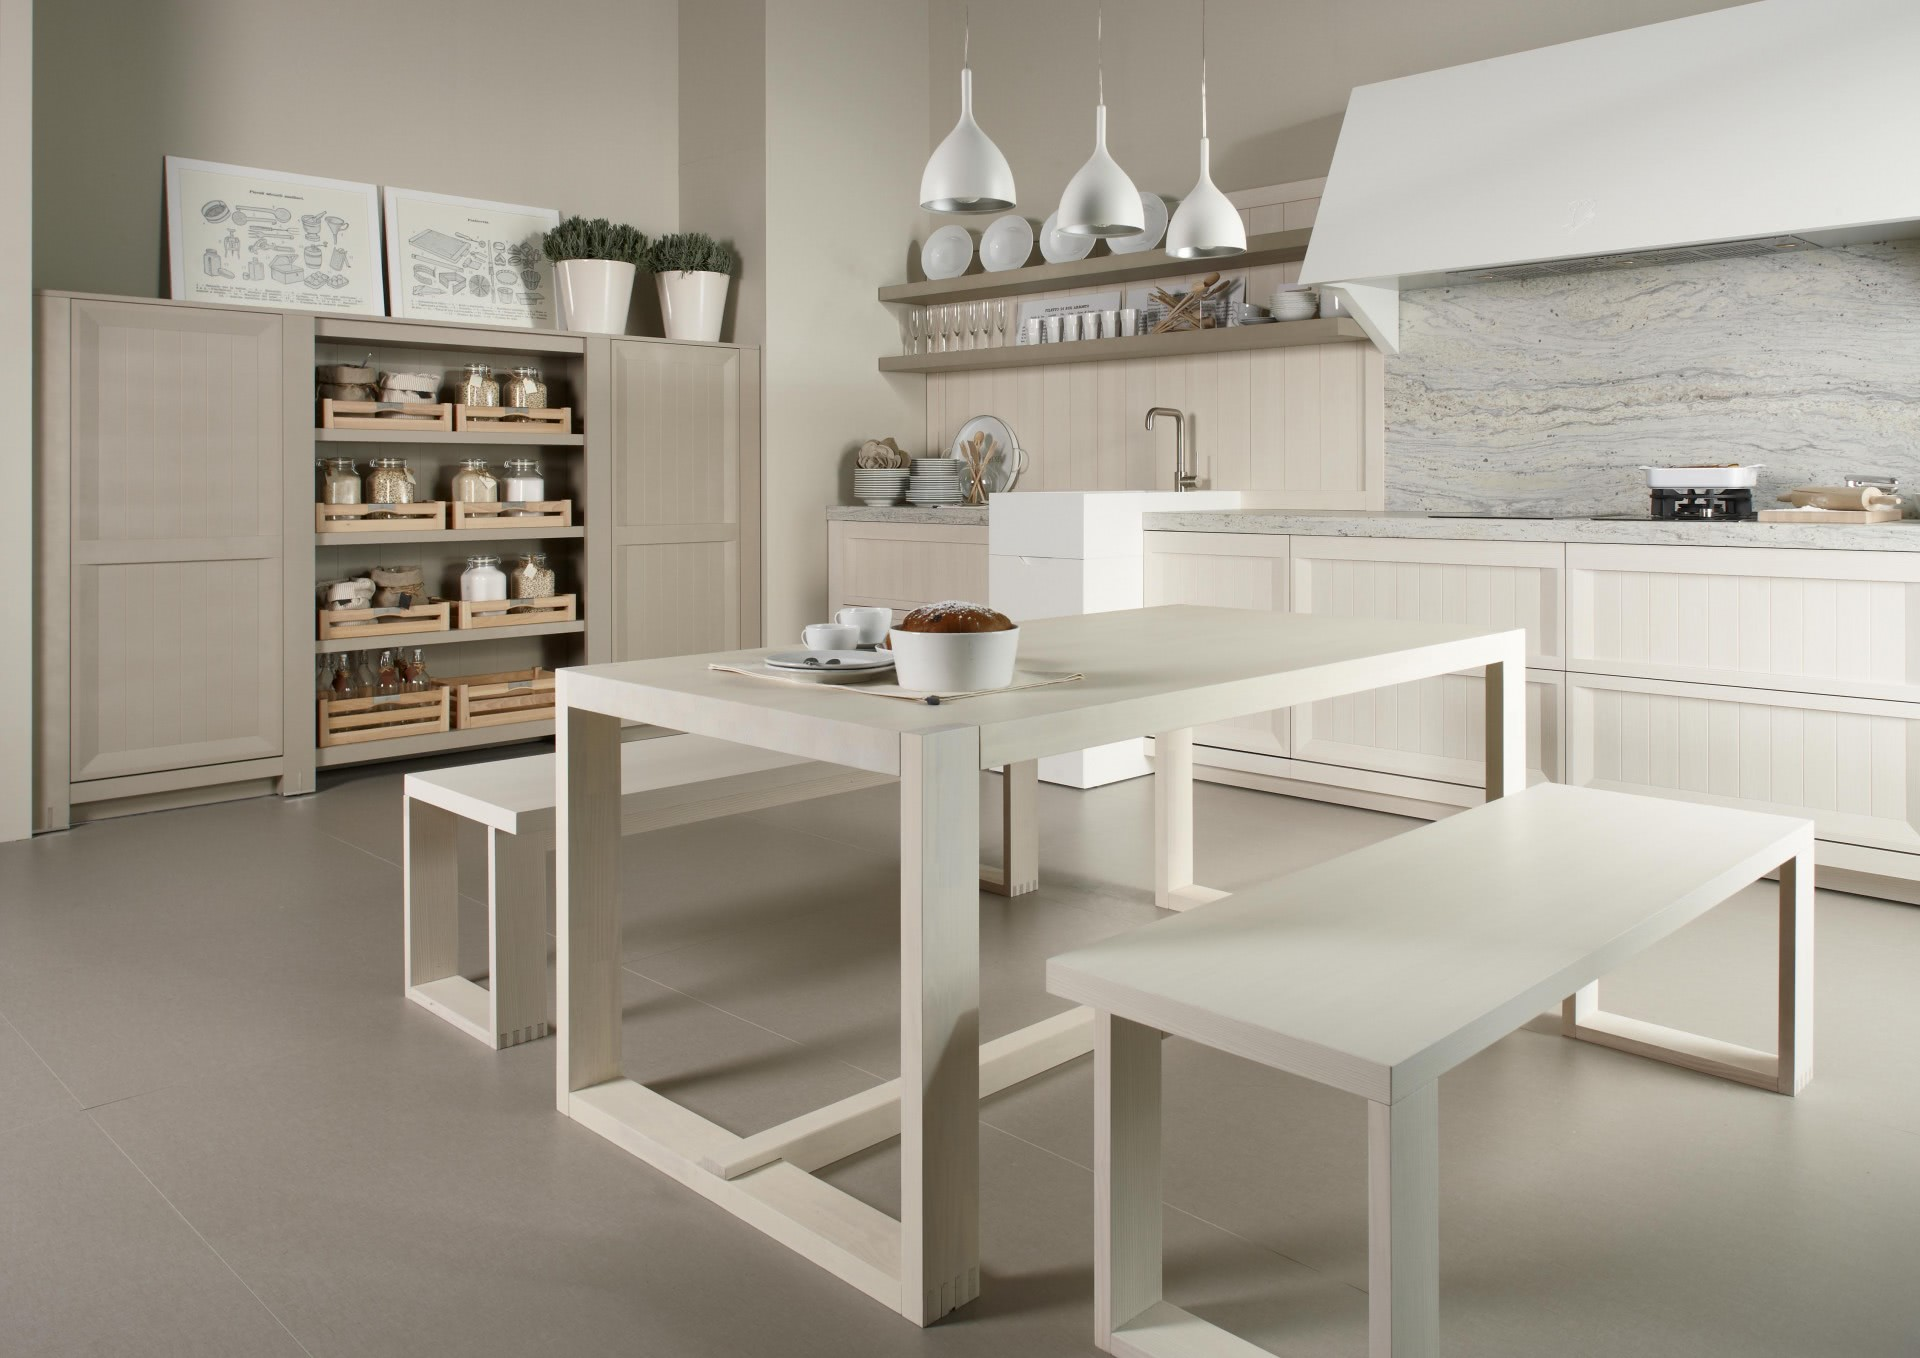 Muebles de cocina a medida con calidad artesanal acana for Momento actual muebles